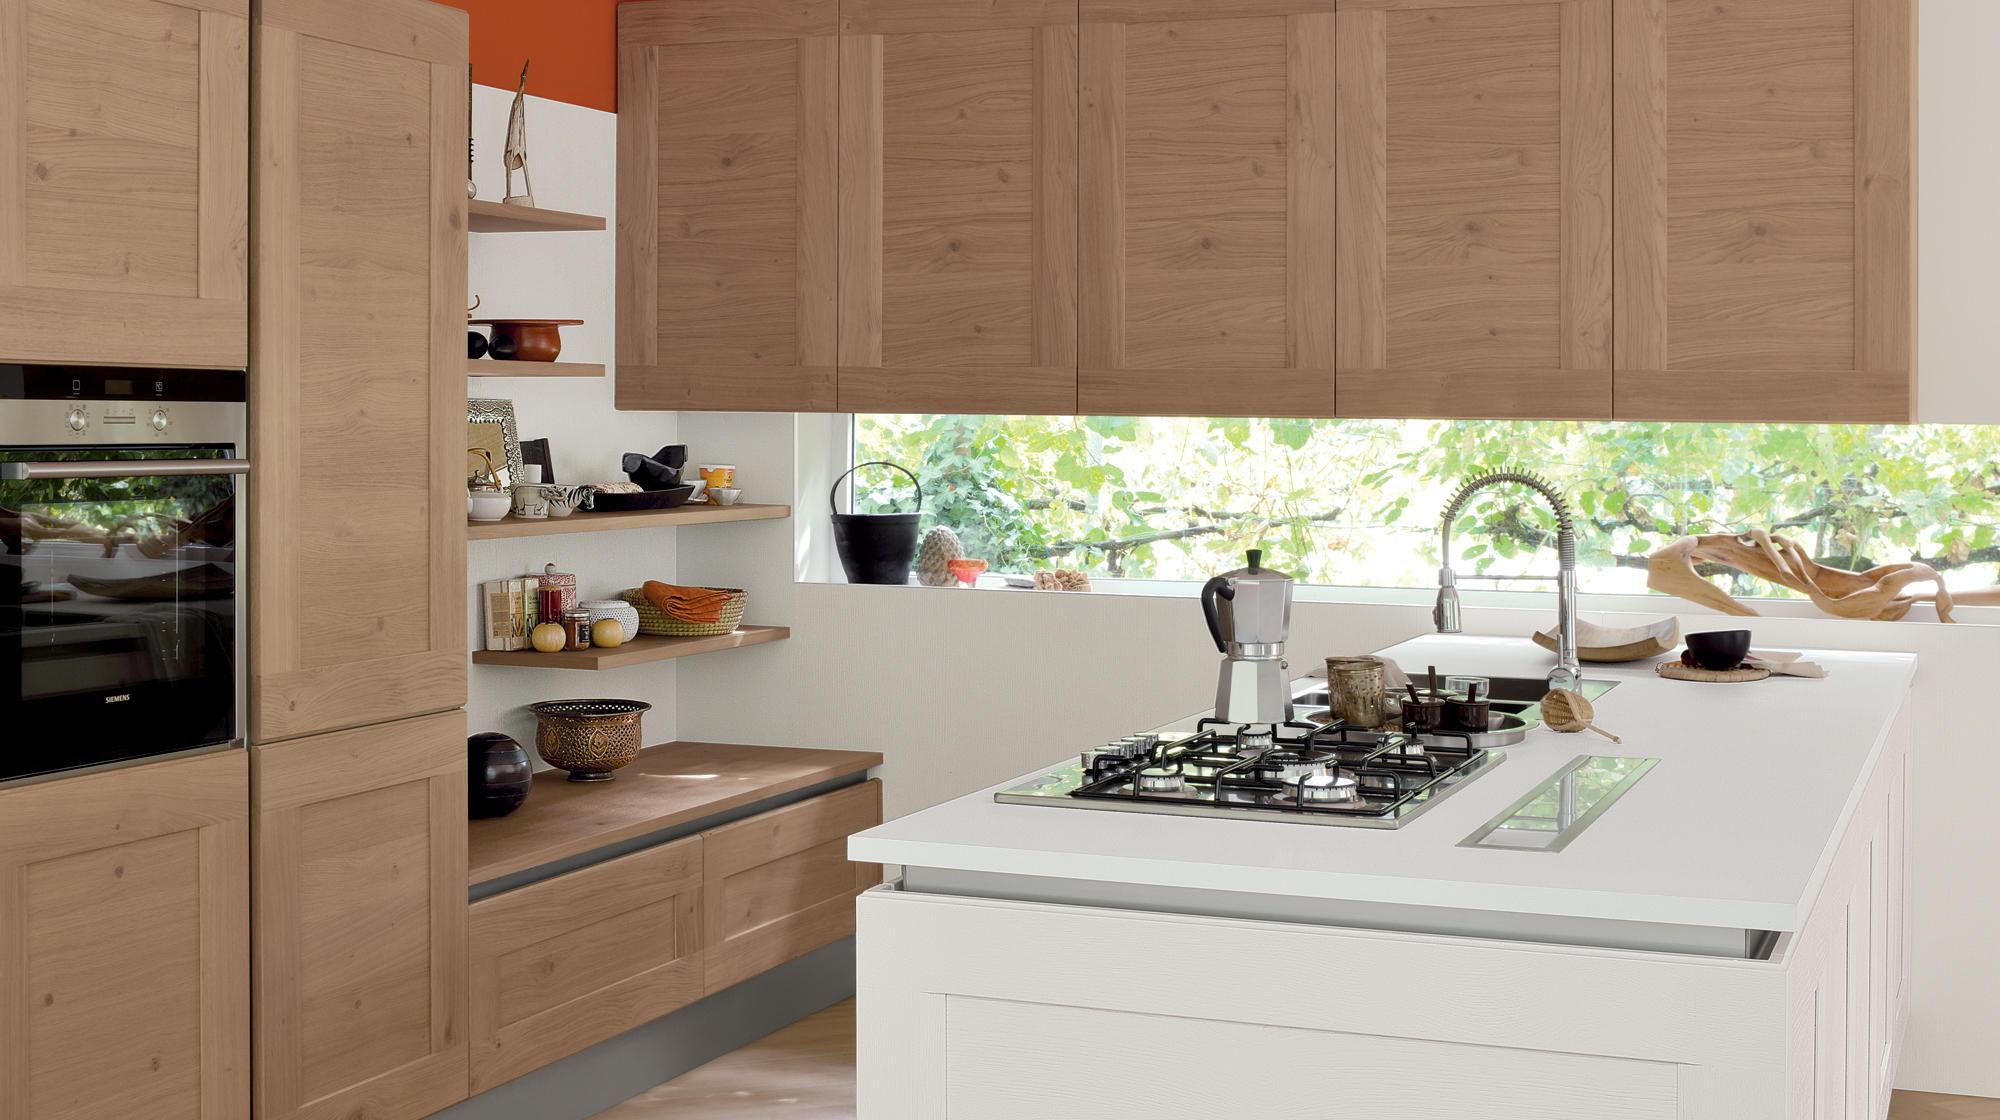 dialogo shellsystem cucine isola veneta cucine architonic. Black Bedroom Furniture Sets. Home Design Ideas